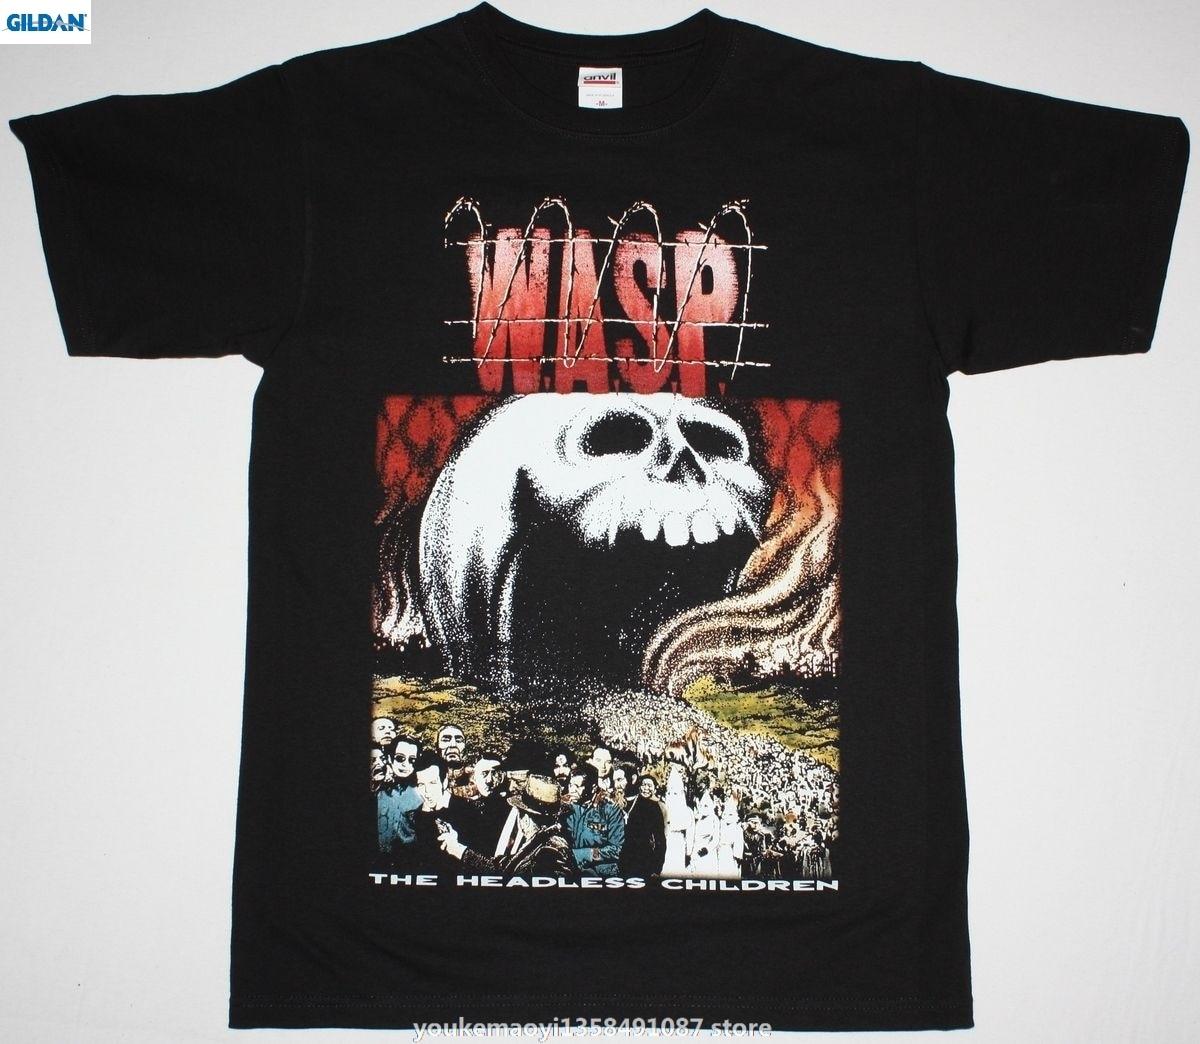 GILDAN W.A.S.P. THE HEADLESS CHILDREN89 WASP HEAVY METAL BAND RATT NEW BLACK T-SHIRT New Brand New Fashion MenS T Shirt